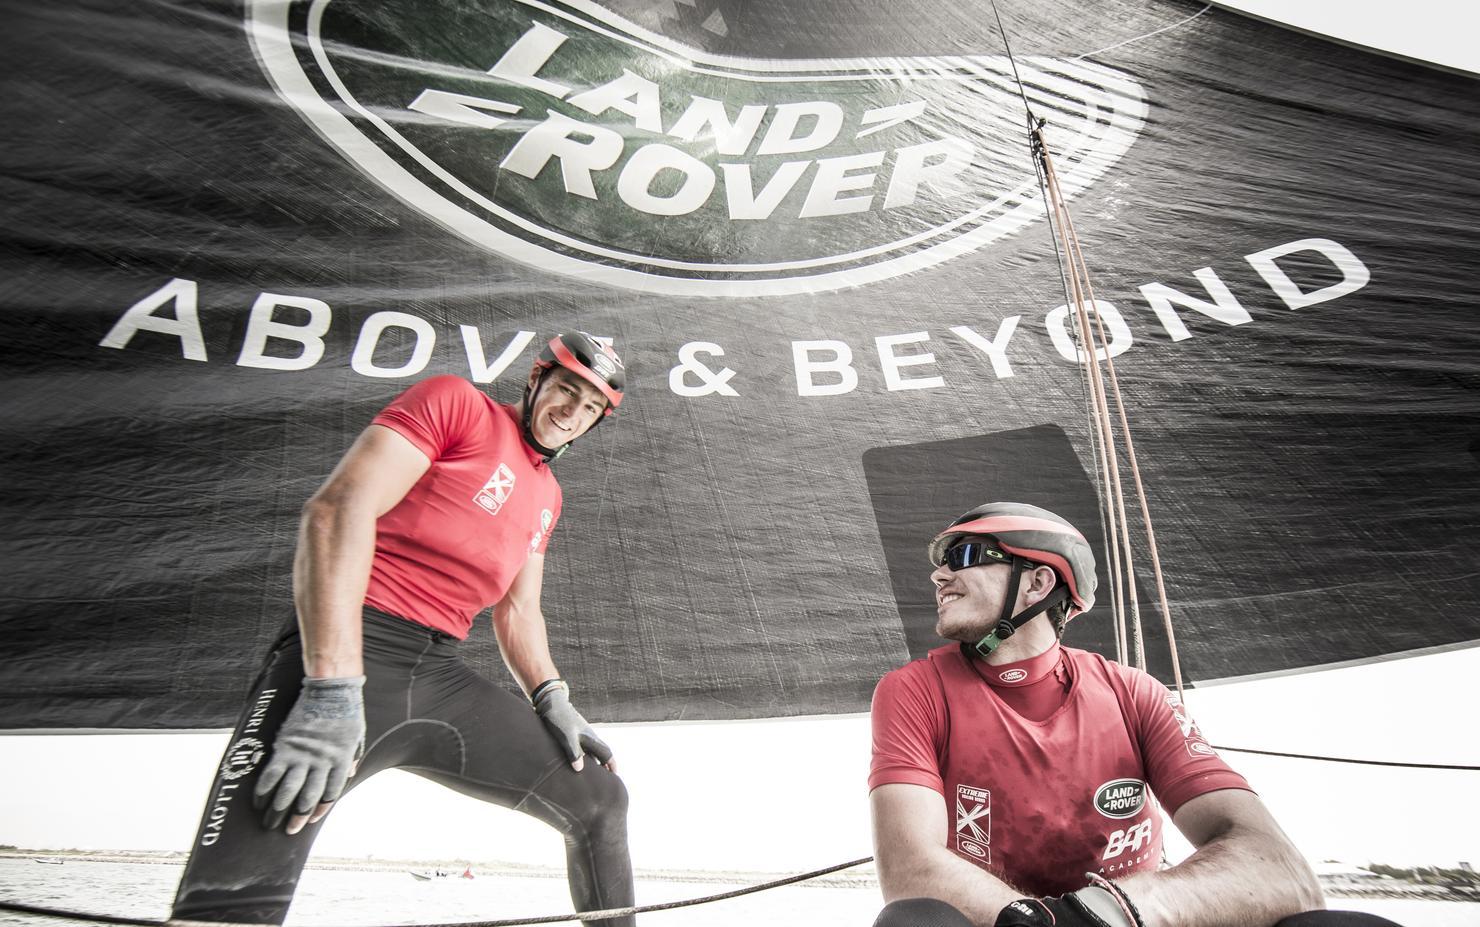 GC32, Foiling Catamaran, Muscat, Oman, The Extreme Sailing Series, Bleddyn Mon, Land Rover BAR Academy